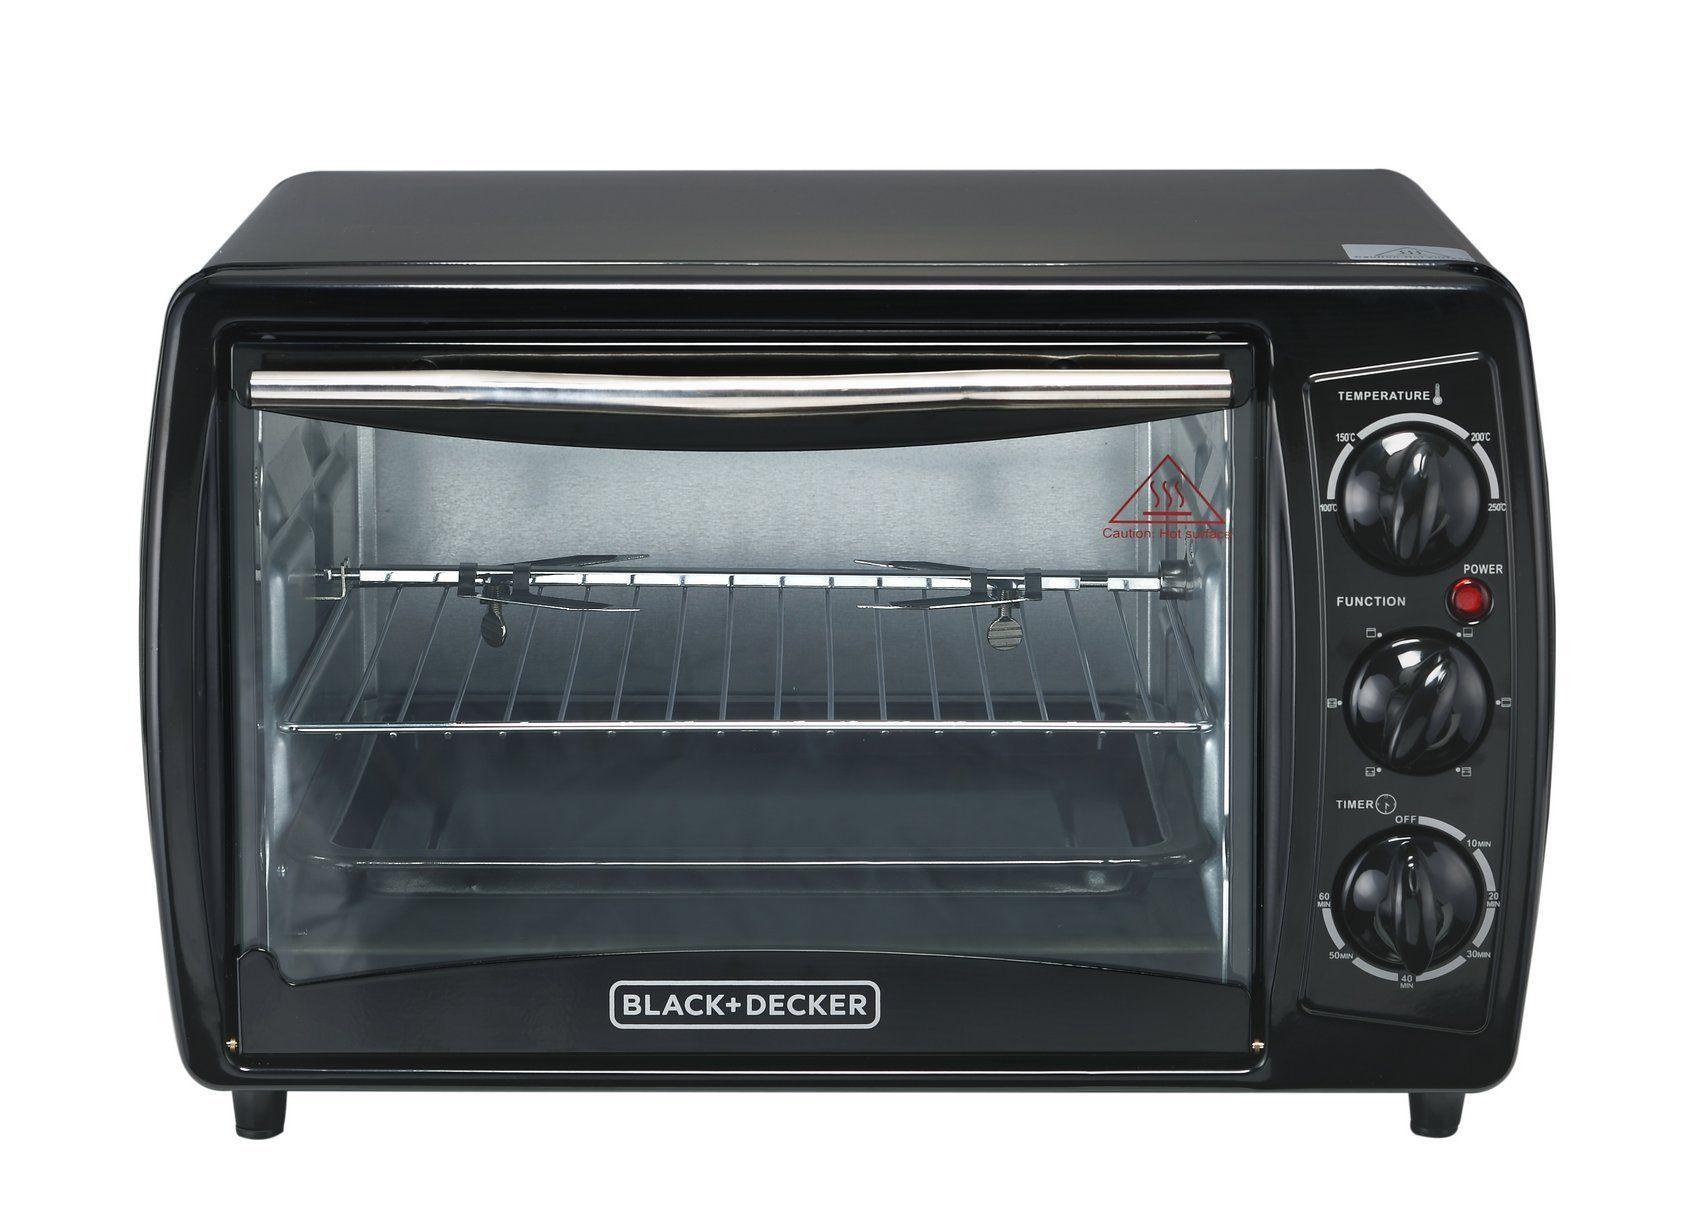 Black And Decker Tro2000r 19 L Toaster Oven With Rotisserie Nonusa